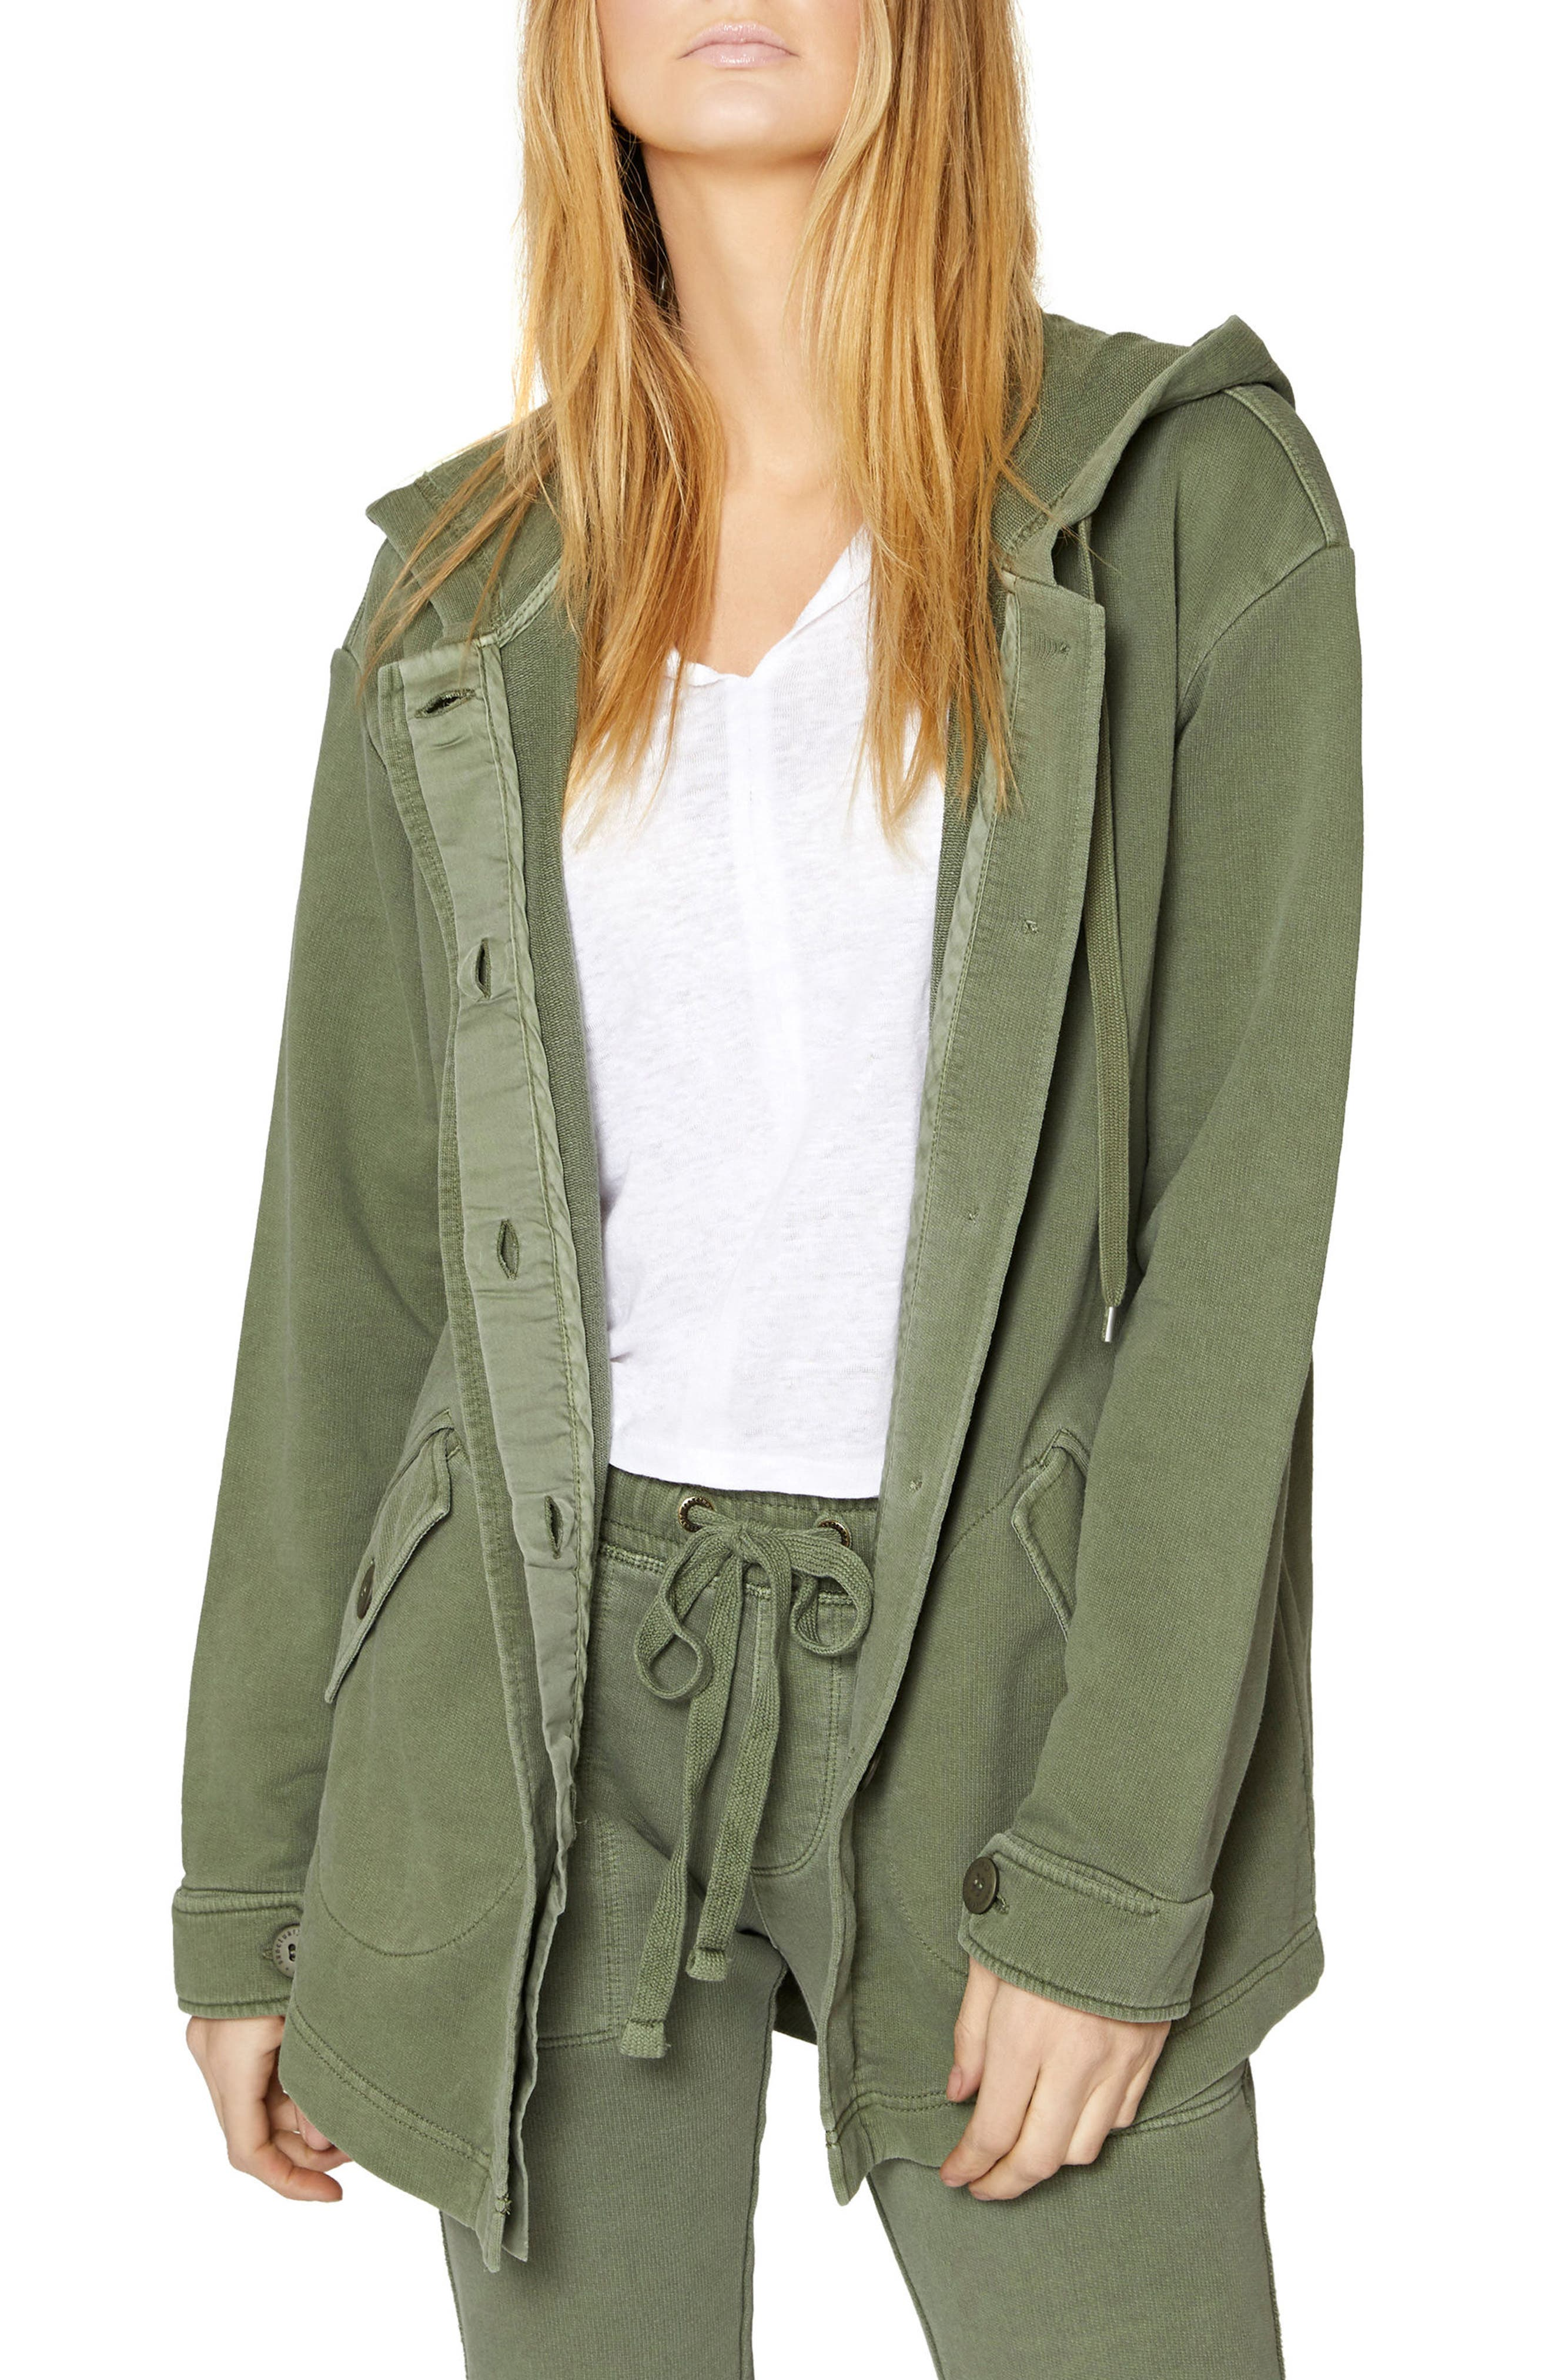 Alternate Image 1 Selected - Sanctuary Top Rank Hooded Jacket